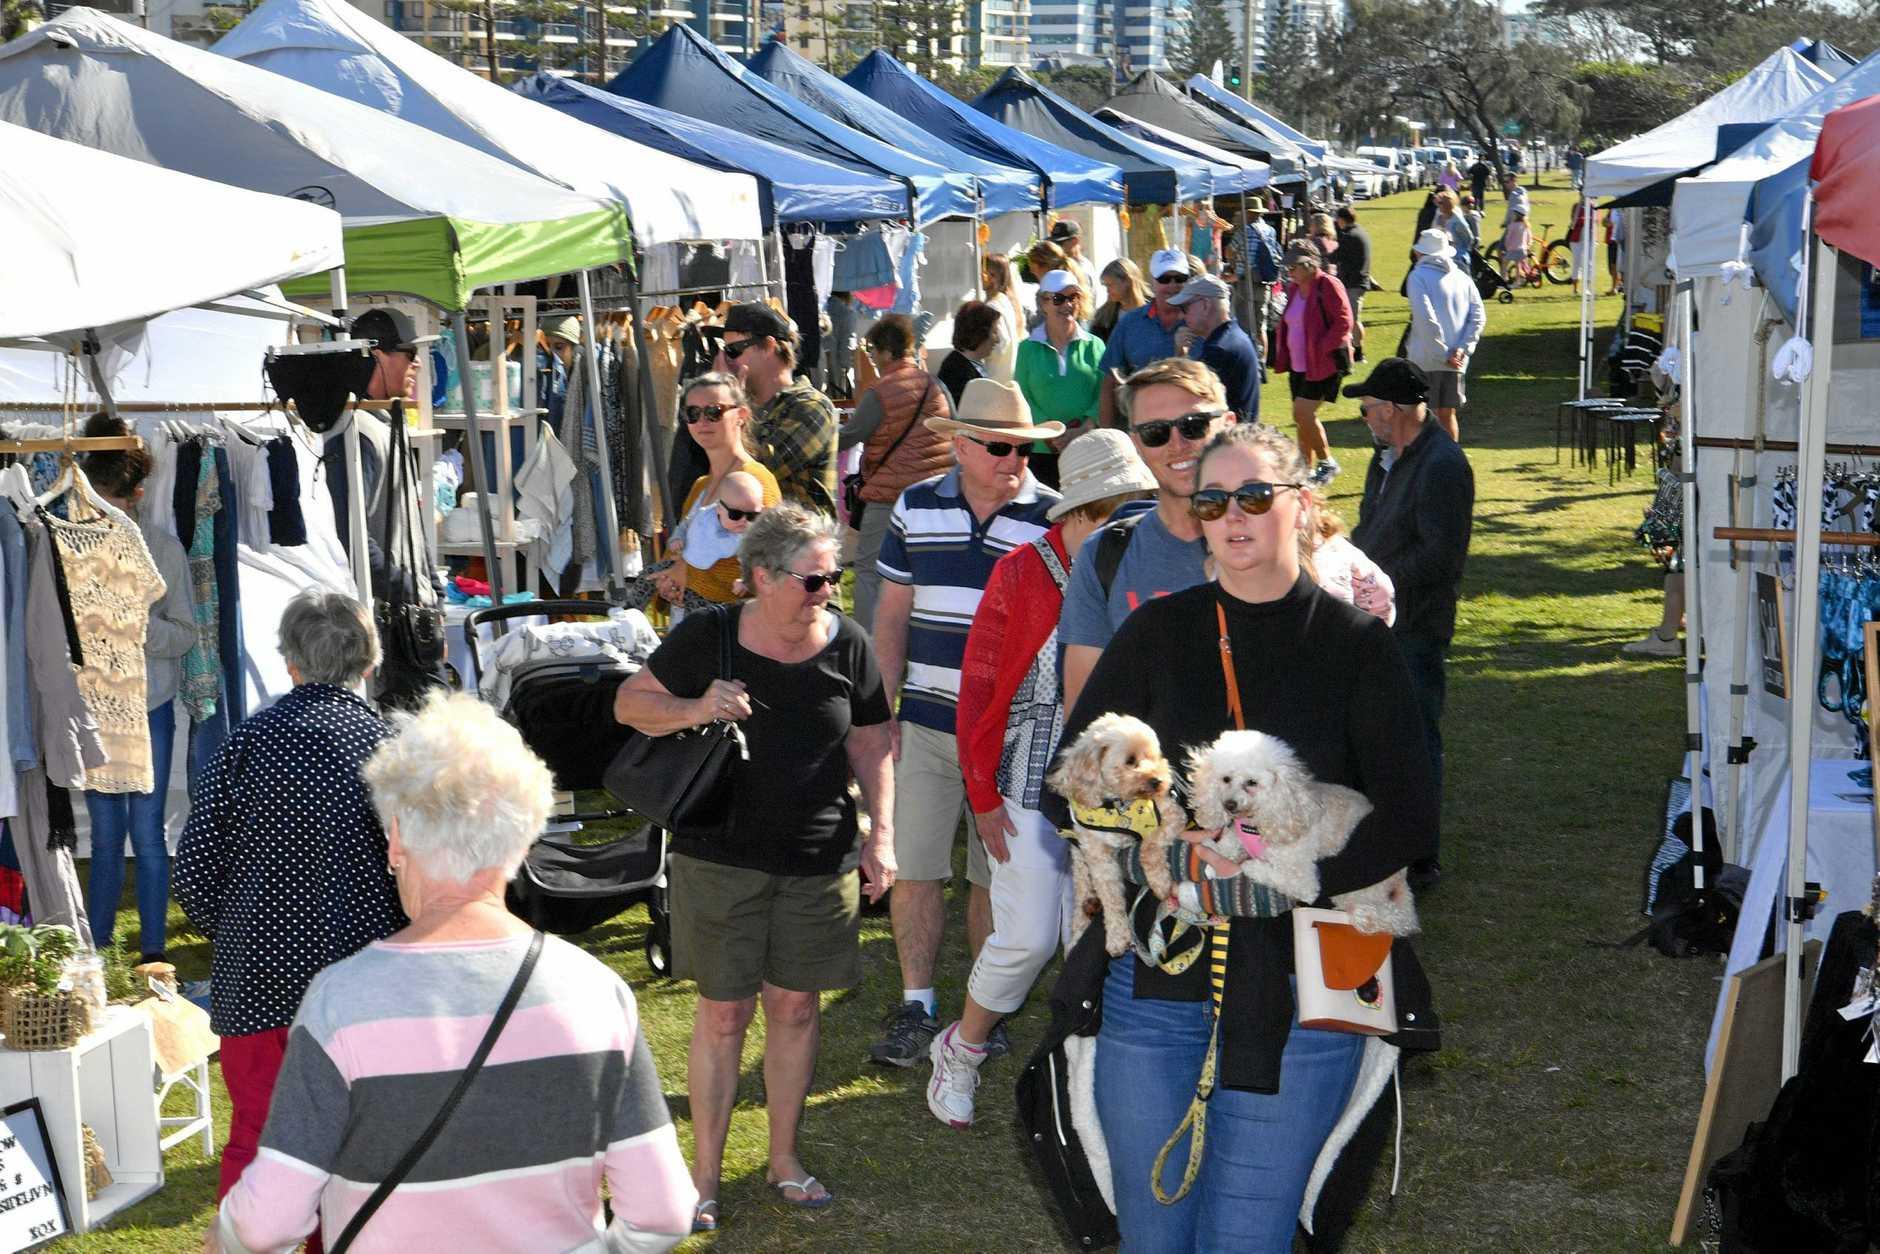 People enjoying the Sunshine Coast Collective Markets at Alexandra Headland.